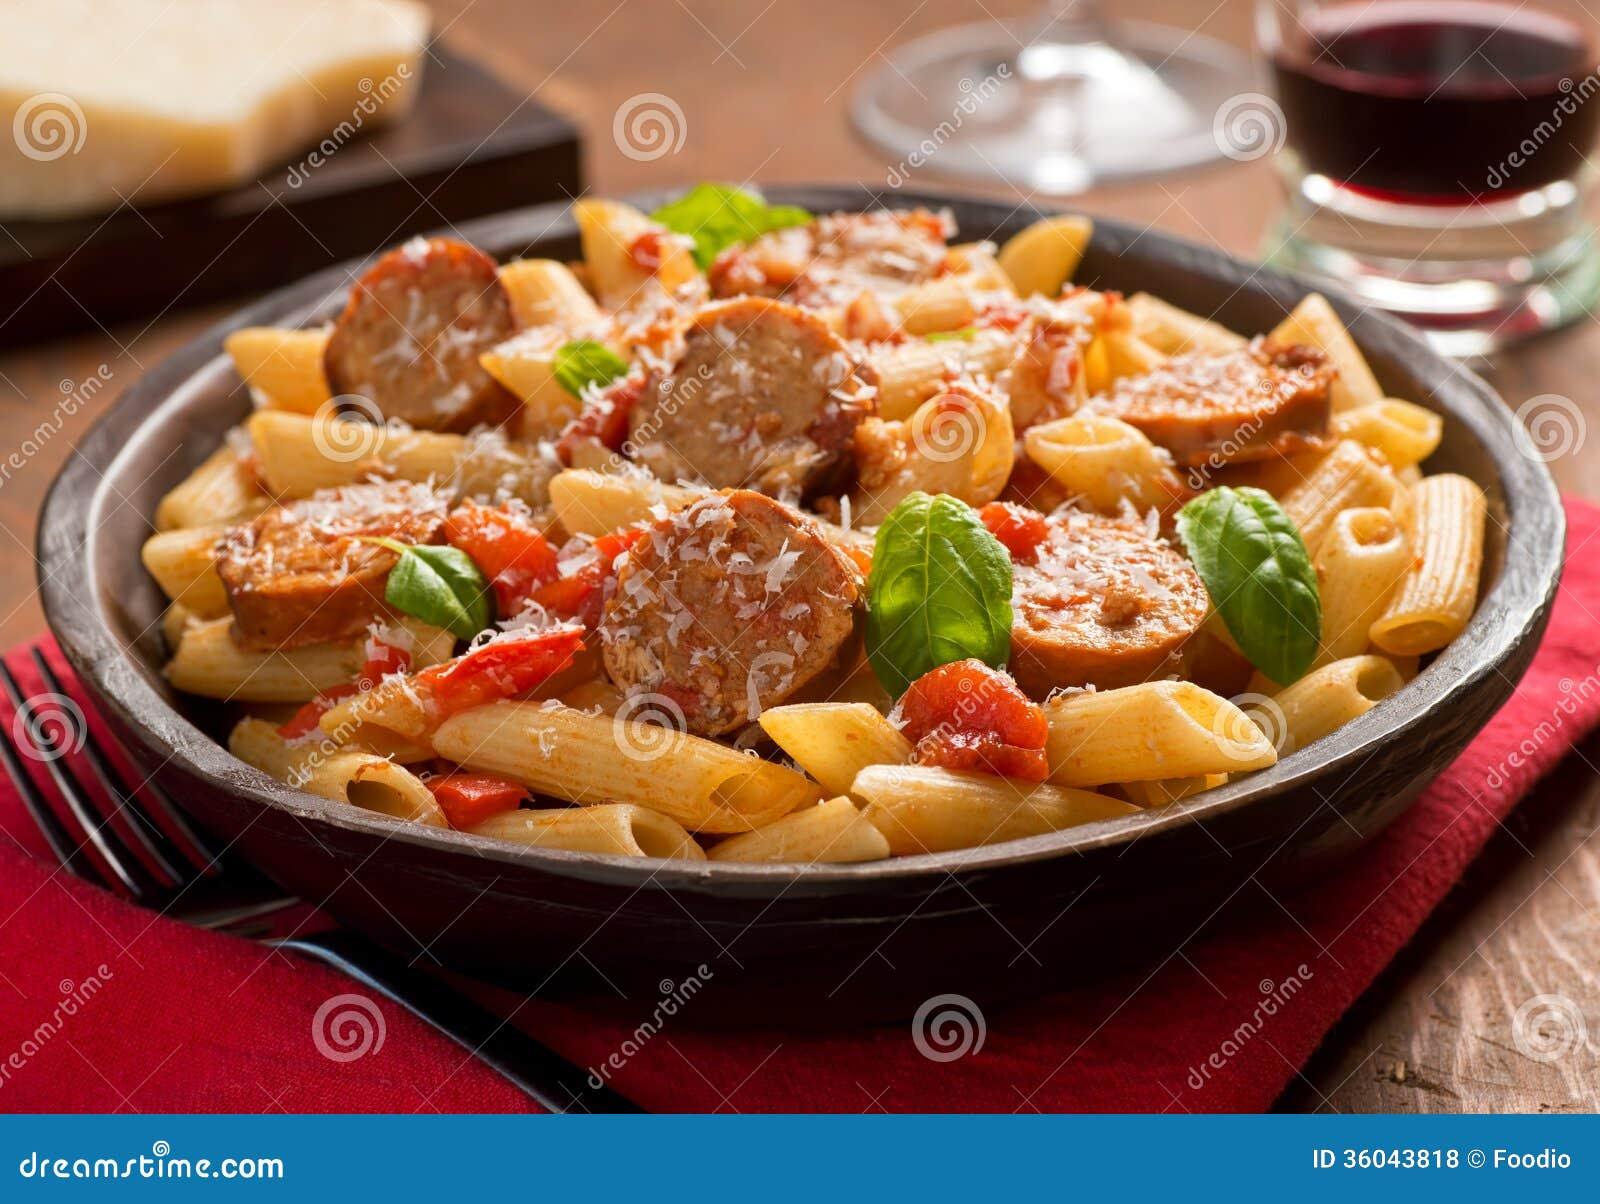 Pasta With Sausage Royalty Free Stock Photos - Image: 36043818